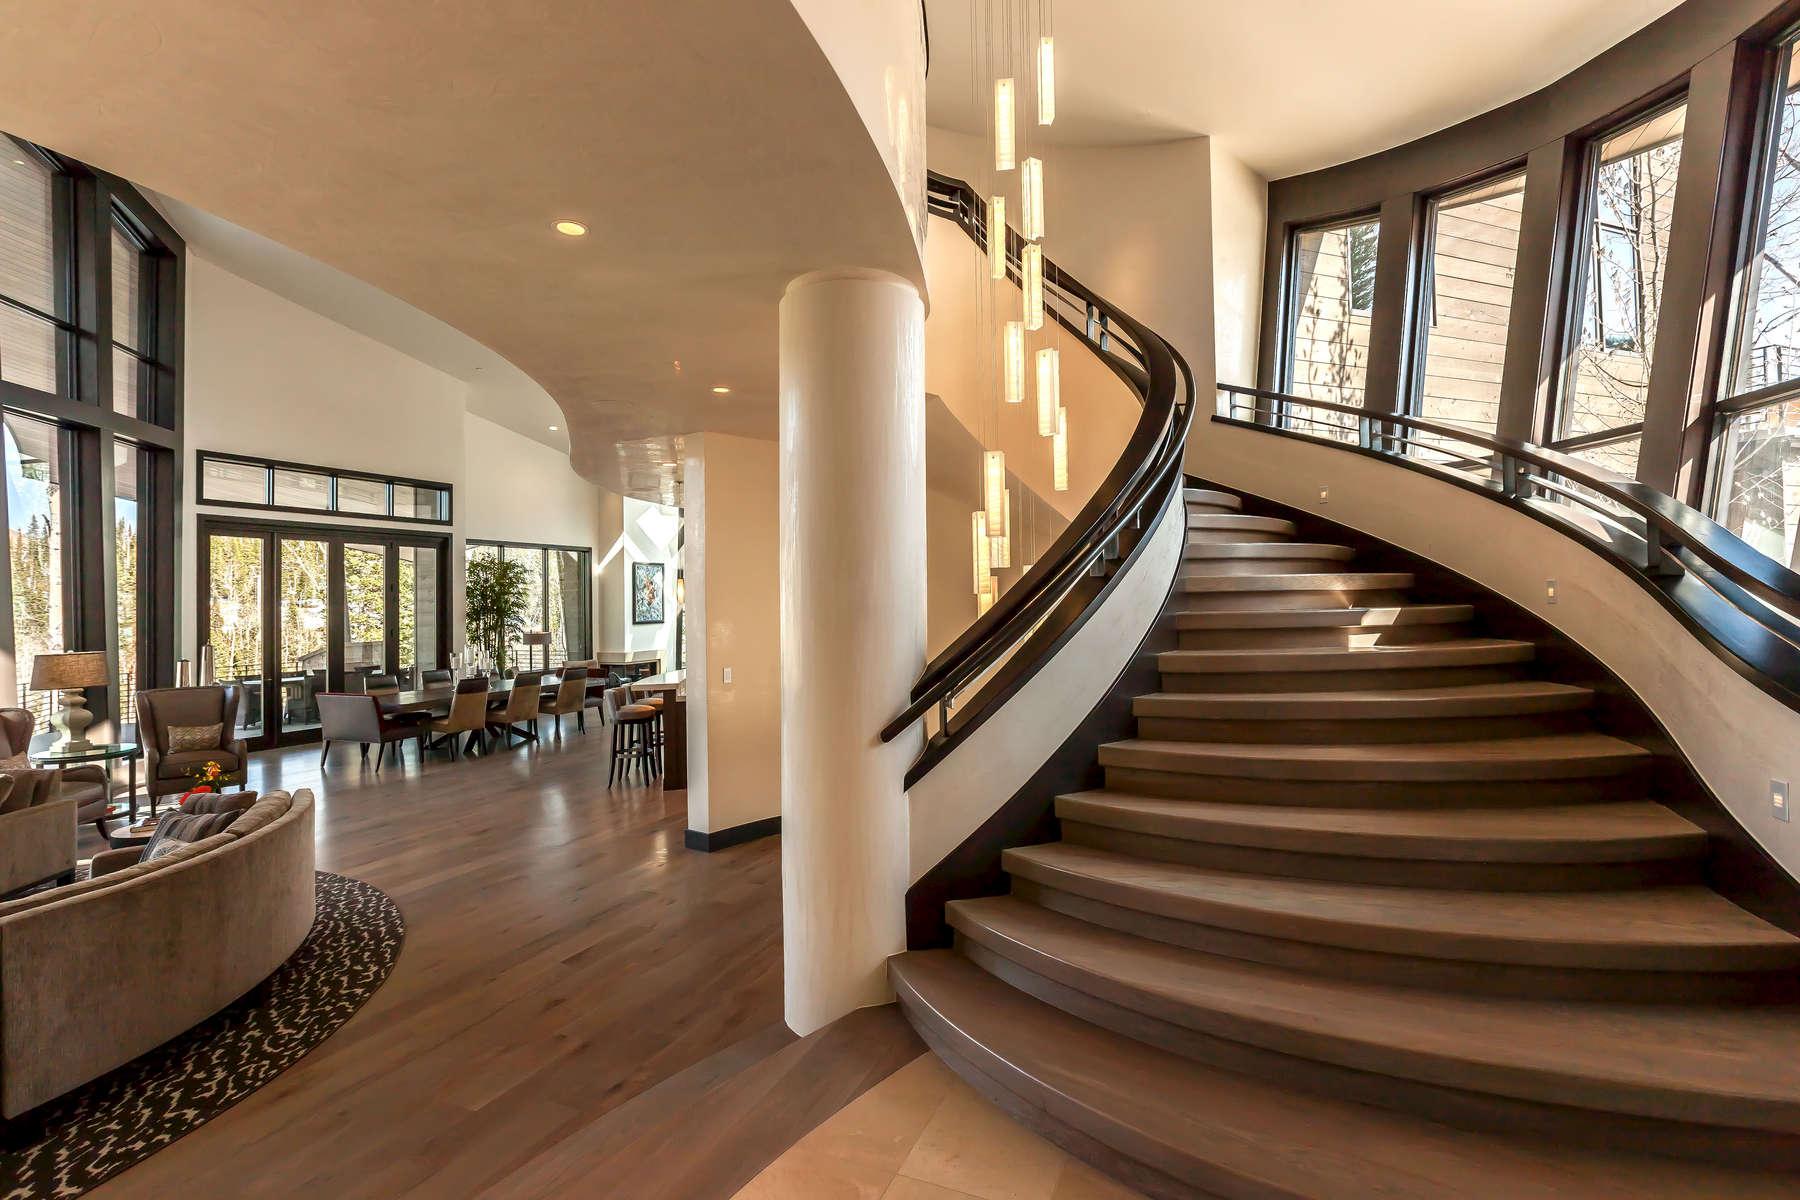 Bennett-Main-House-3501-23_E0E0578-Stair-to-3rd-flr